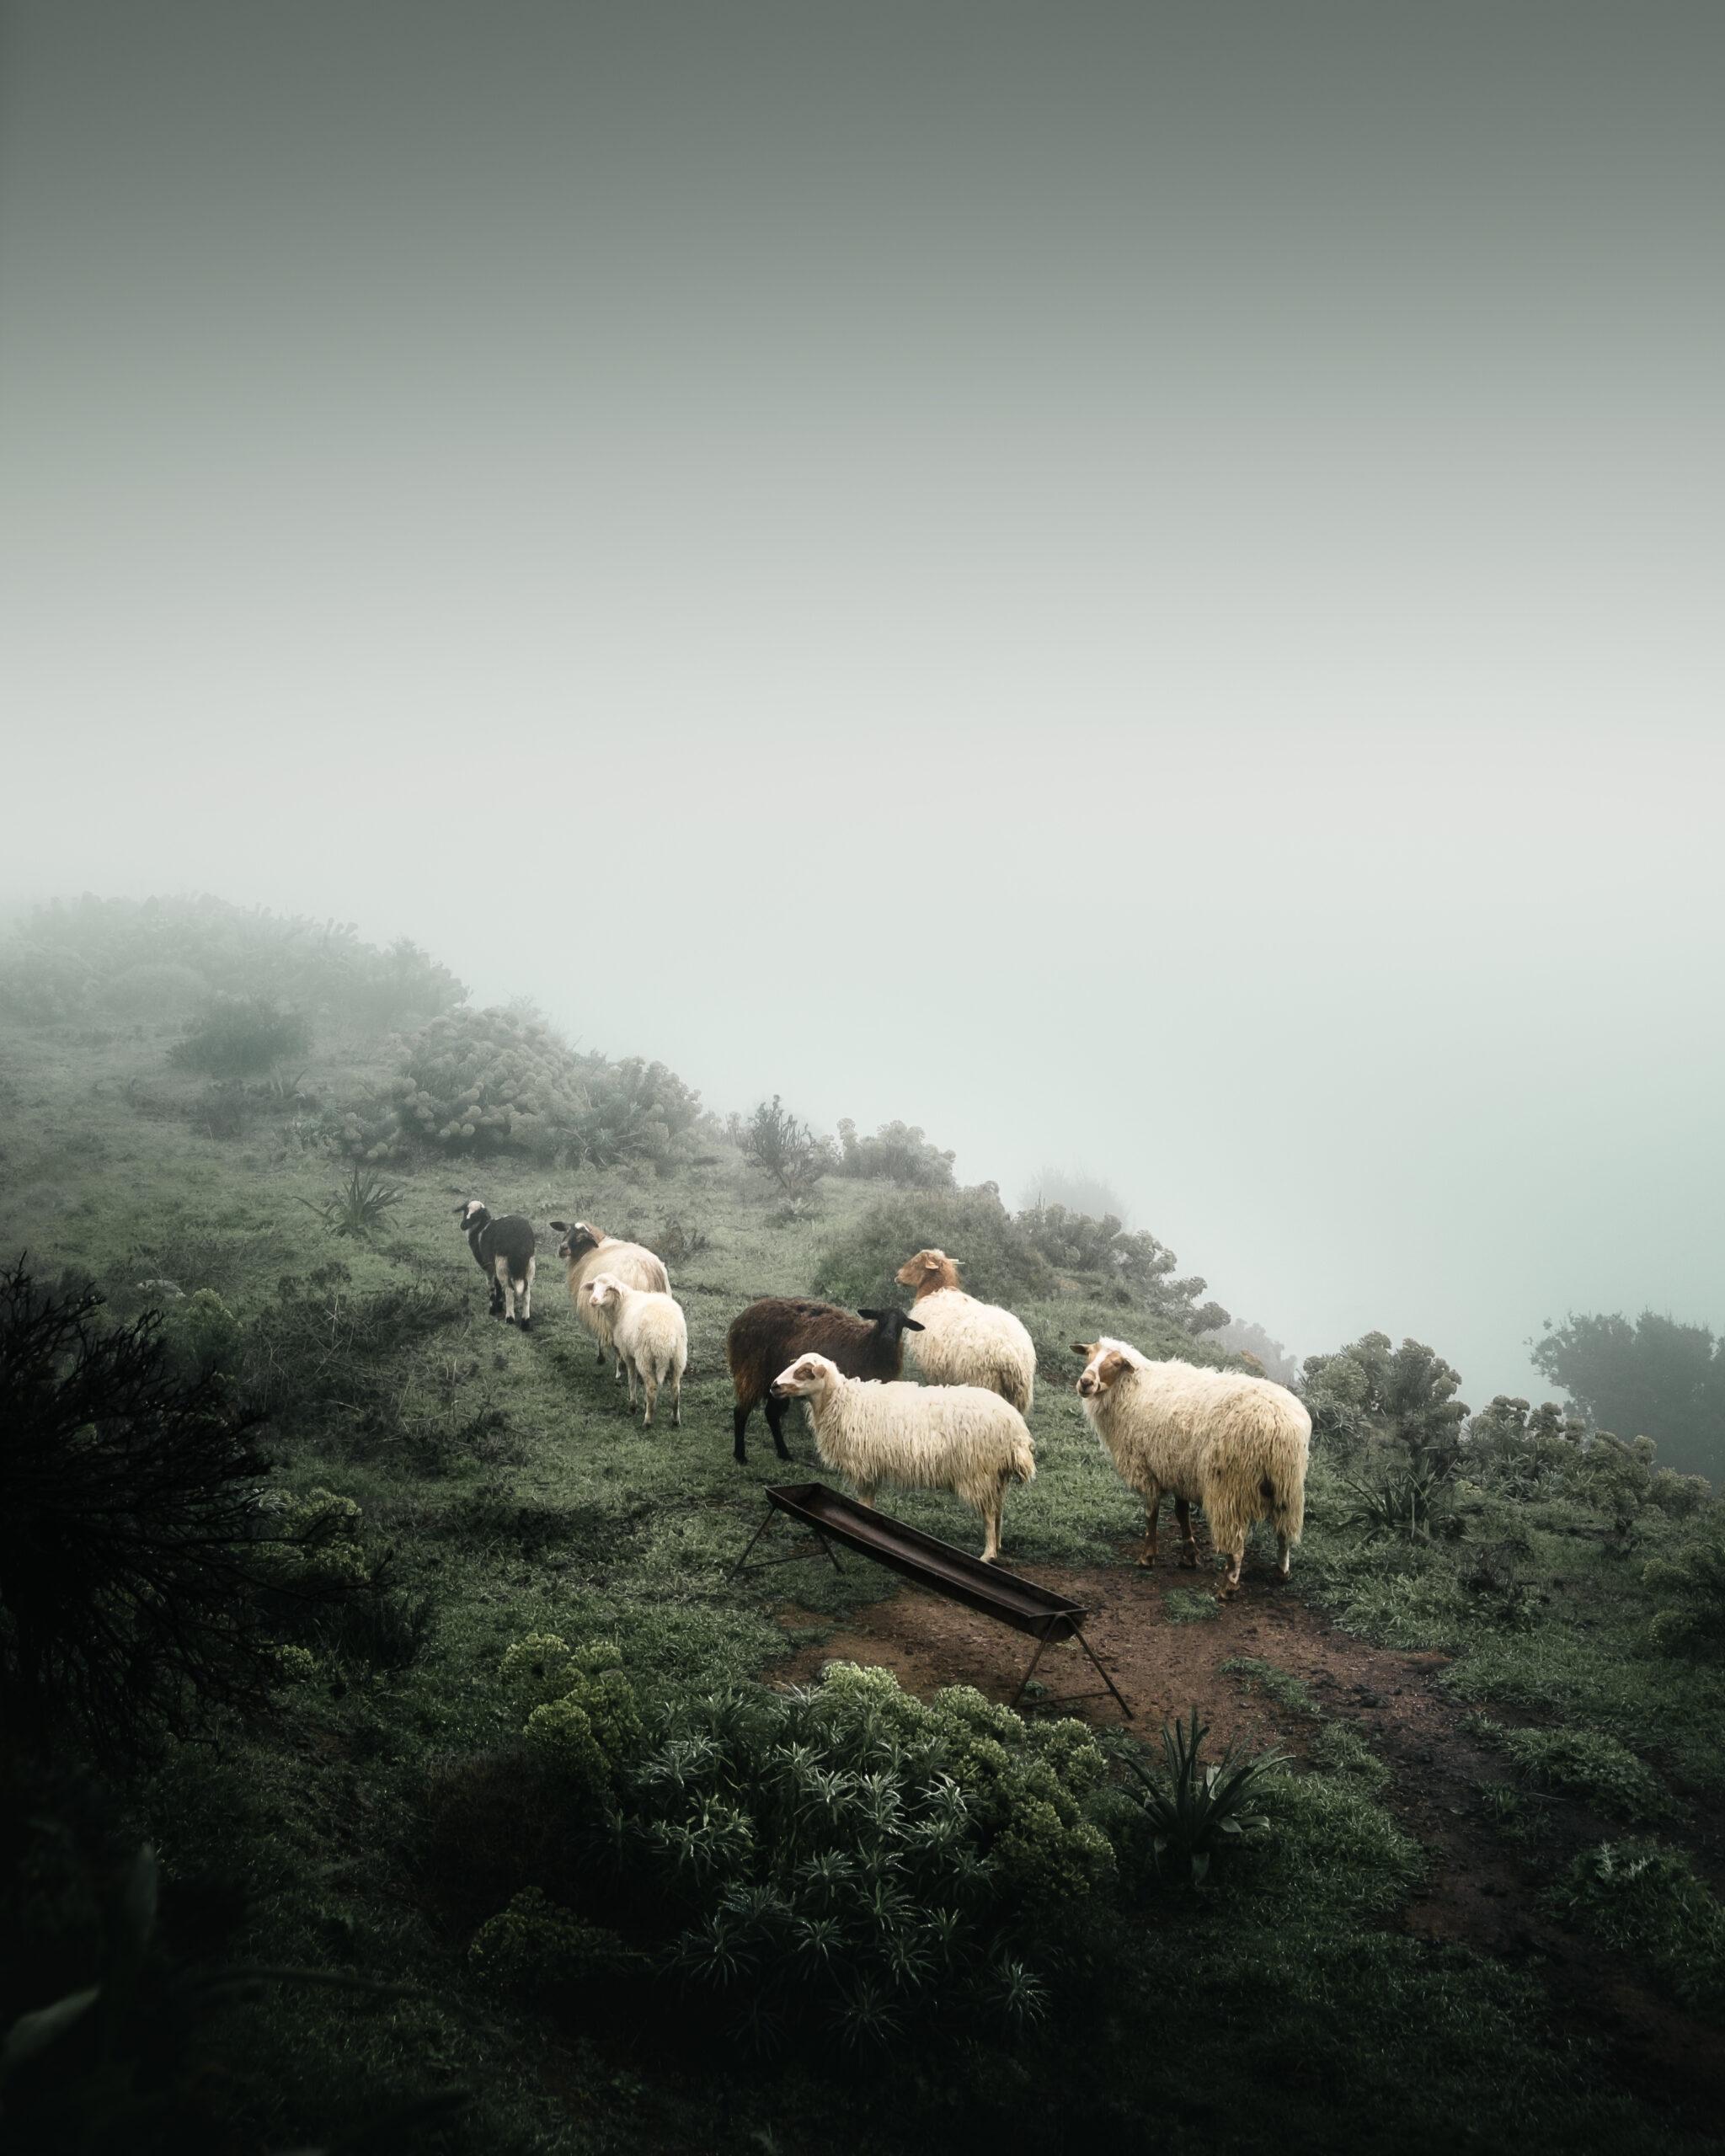 © Theodoros Apeiranthitis, Greece, Winner, National Awards, 2021 Sony World Photography Awards